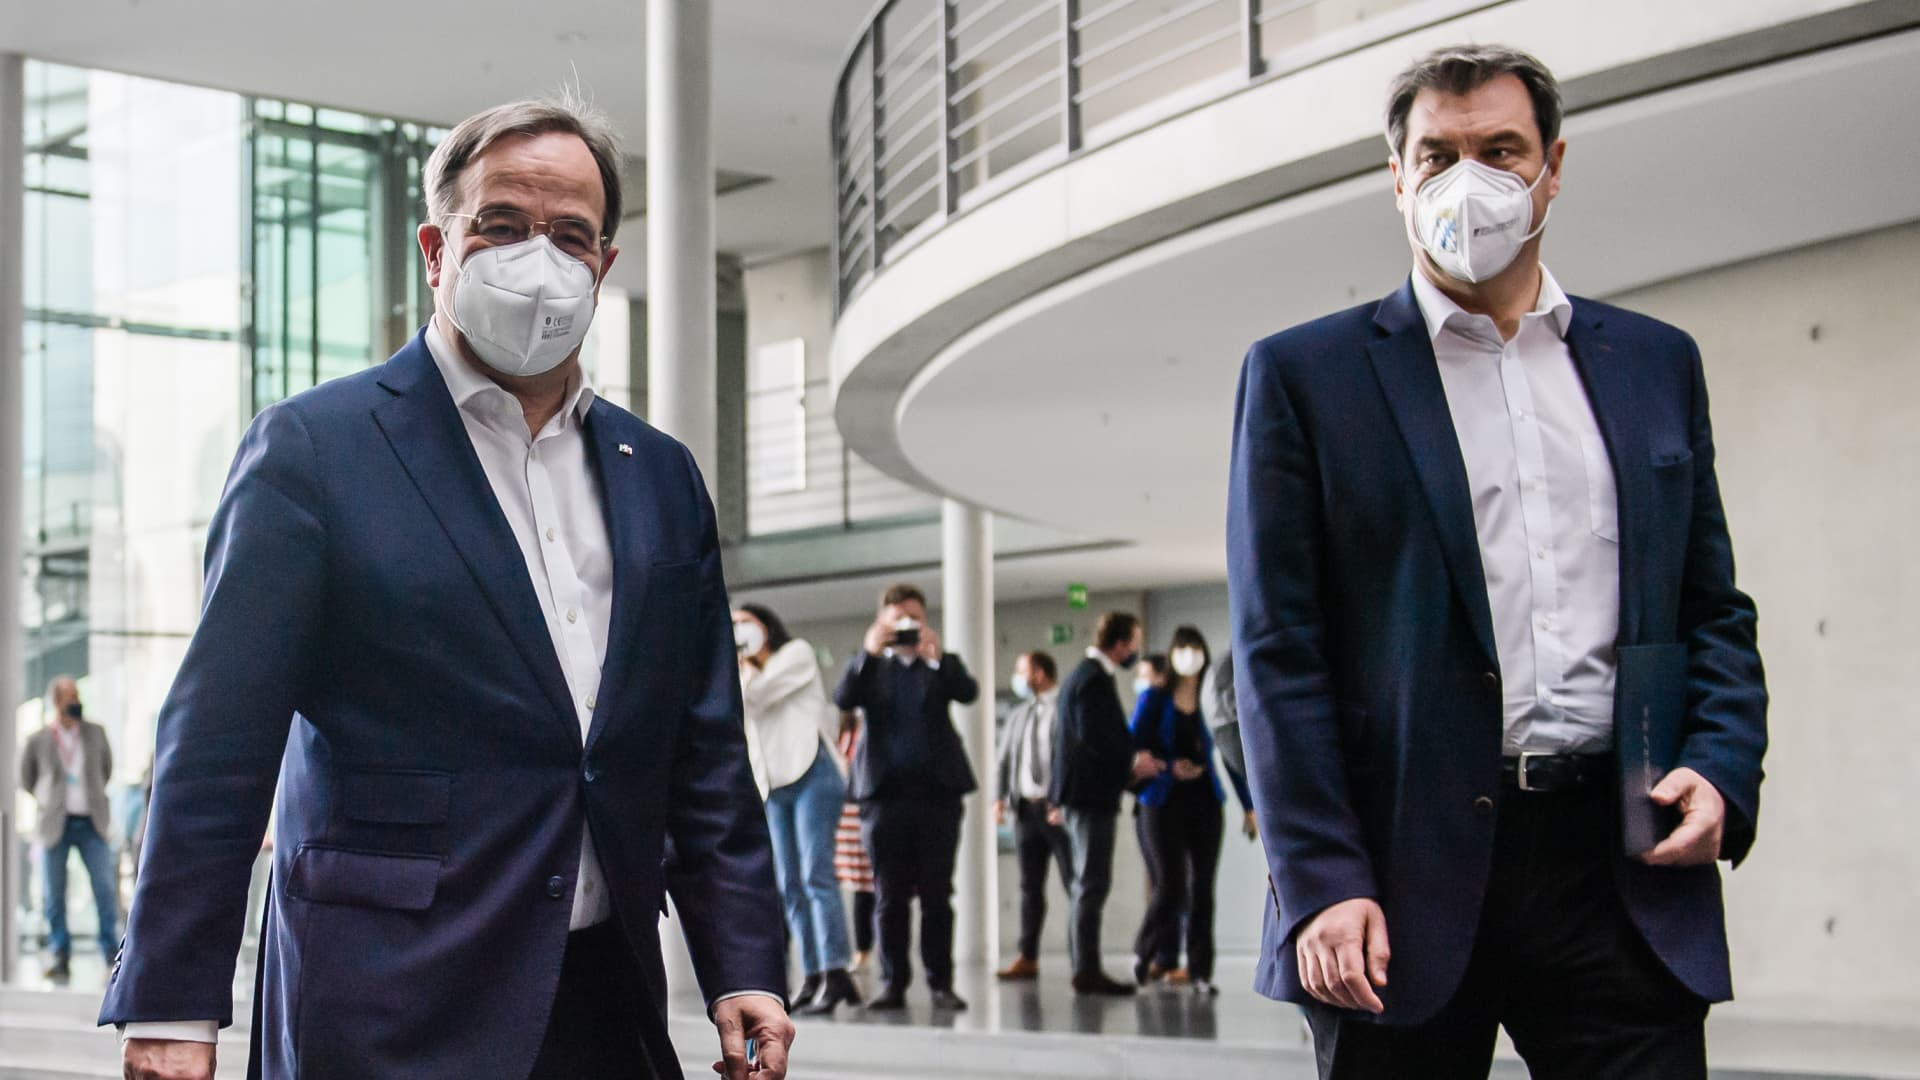 Christian Democratic Union (CDU) party chairman Armin Laschet (L) and State Premier of Bavaria and Christian Social Union (CSU) chairman Markus Soeder.